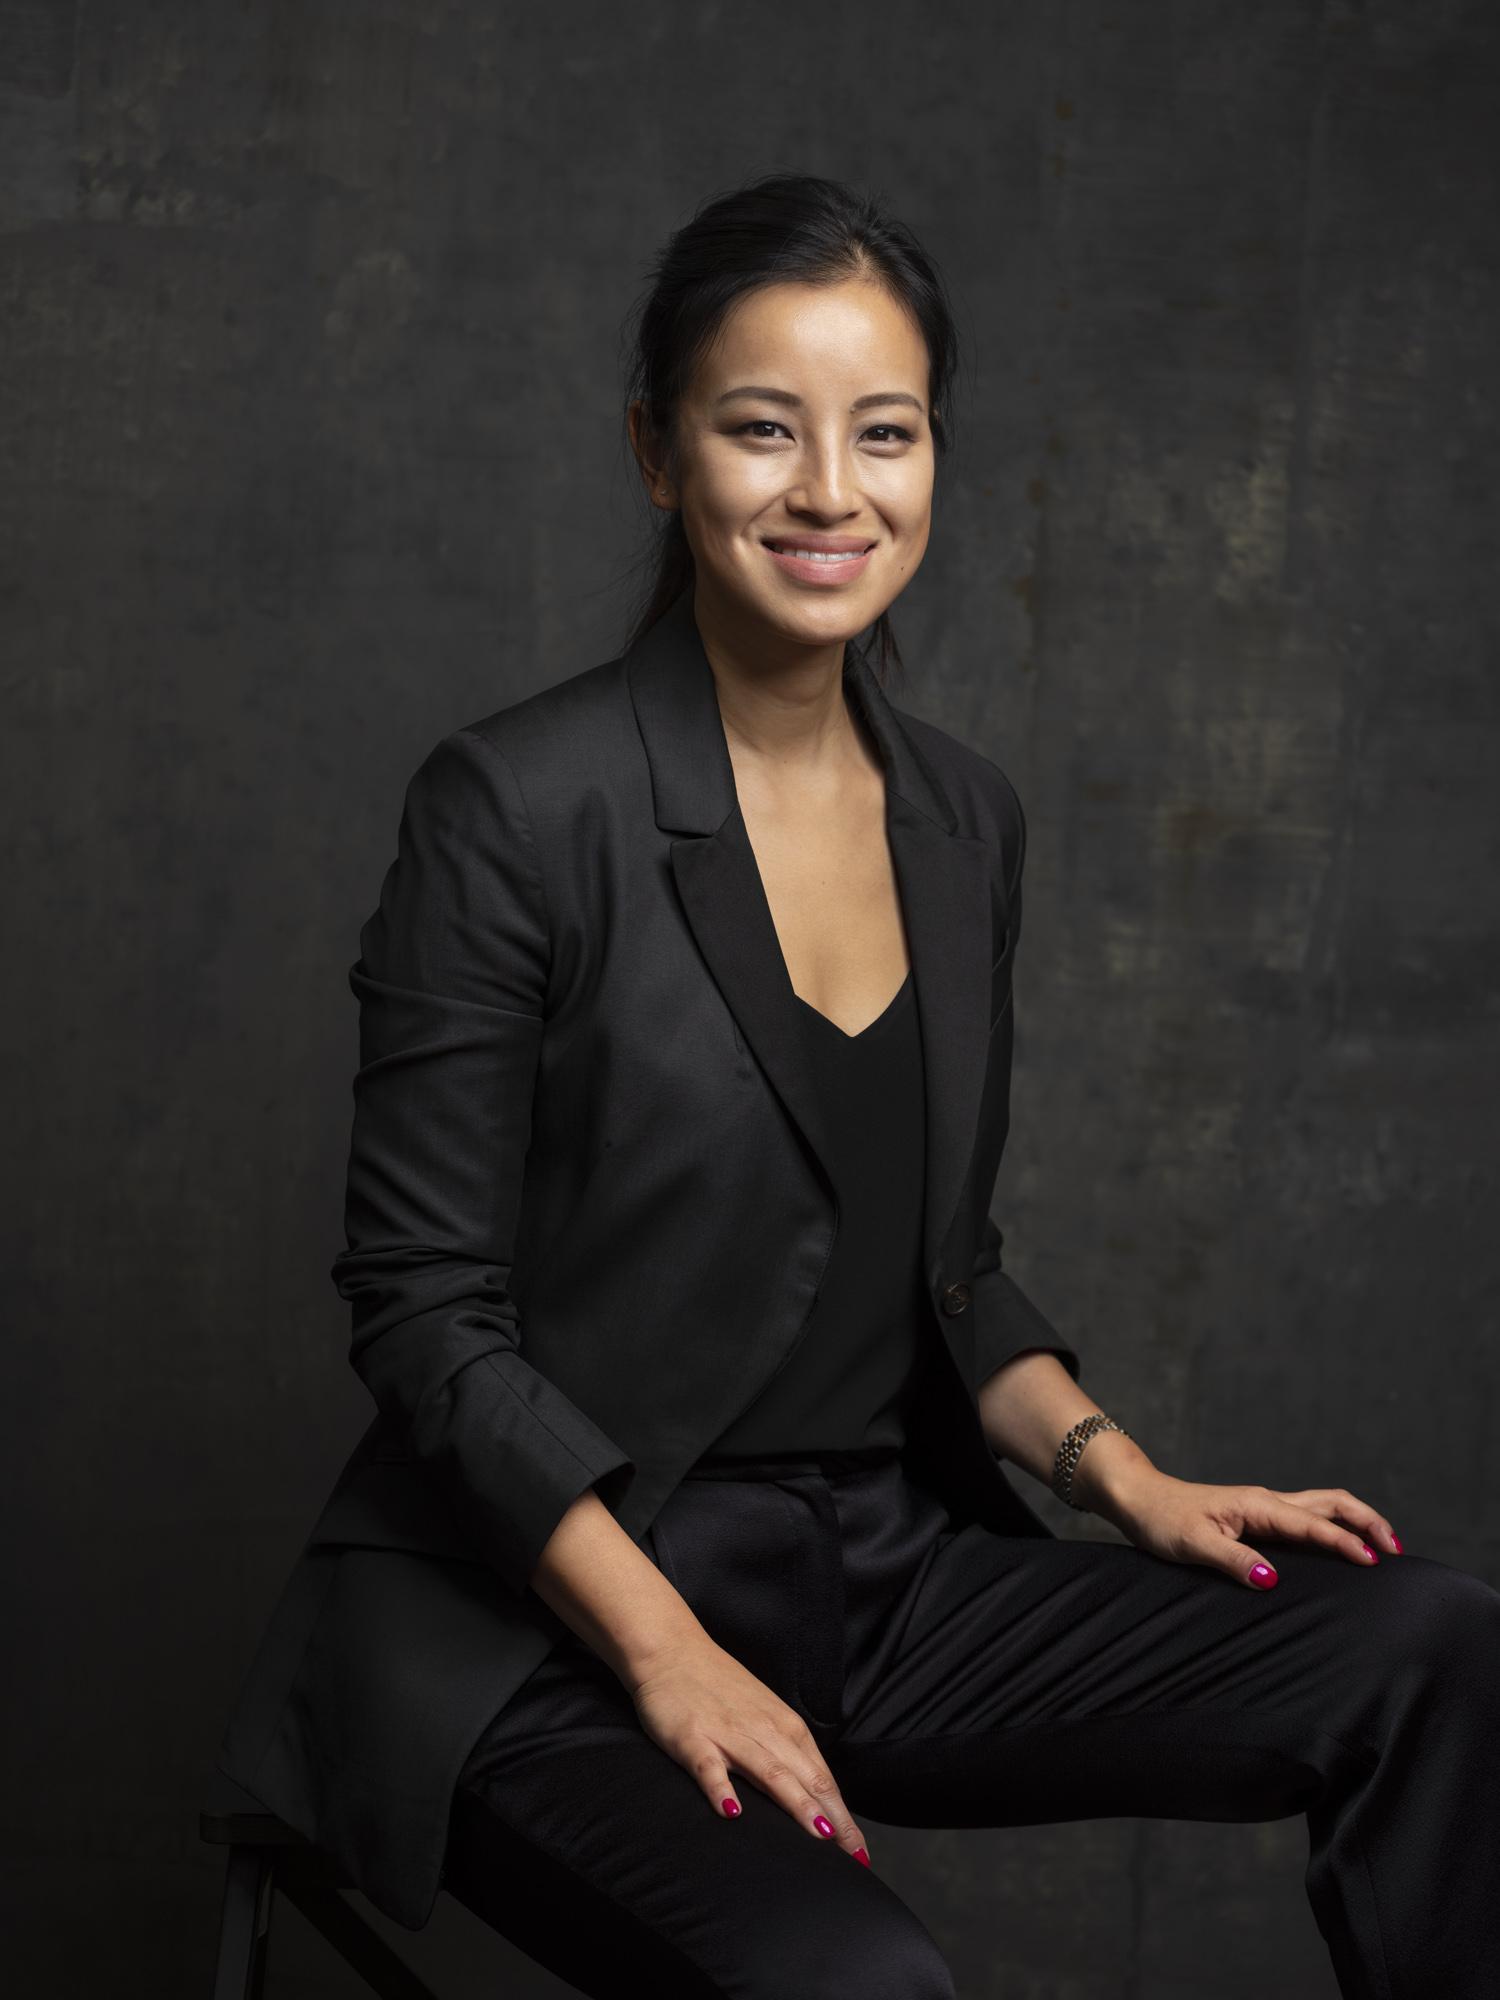 Corporate headshot portrait linkedin profil photography studio singapore services asia photographer smile woman